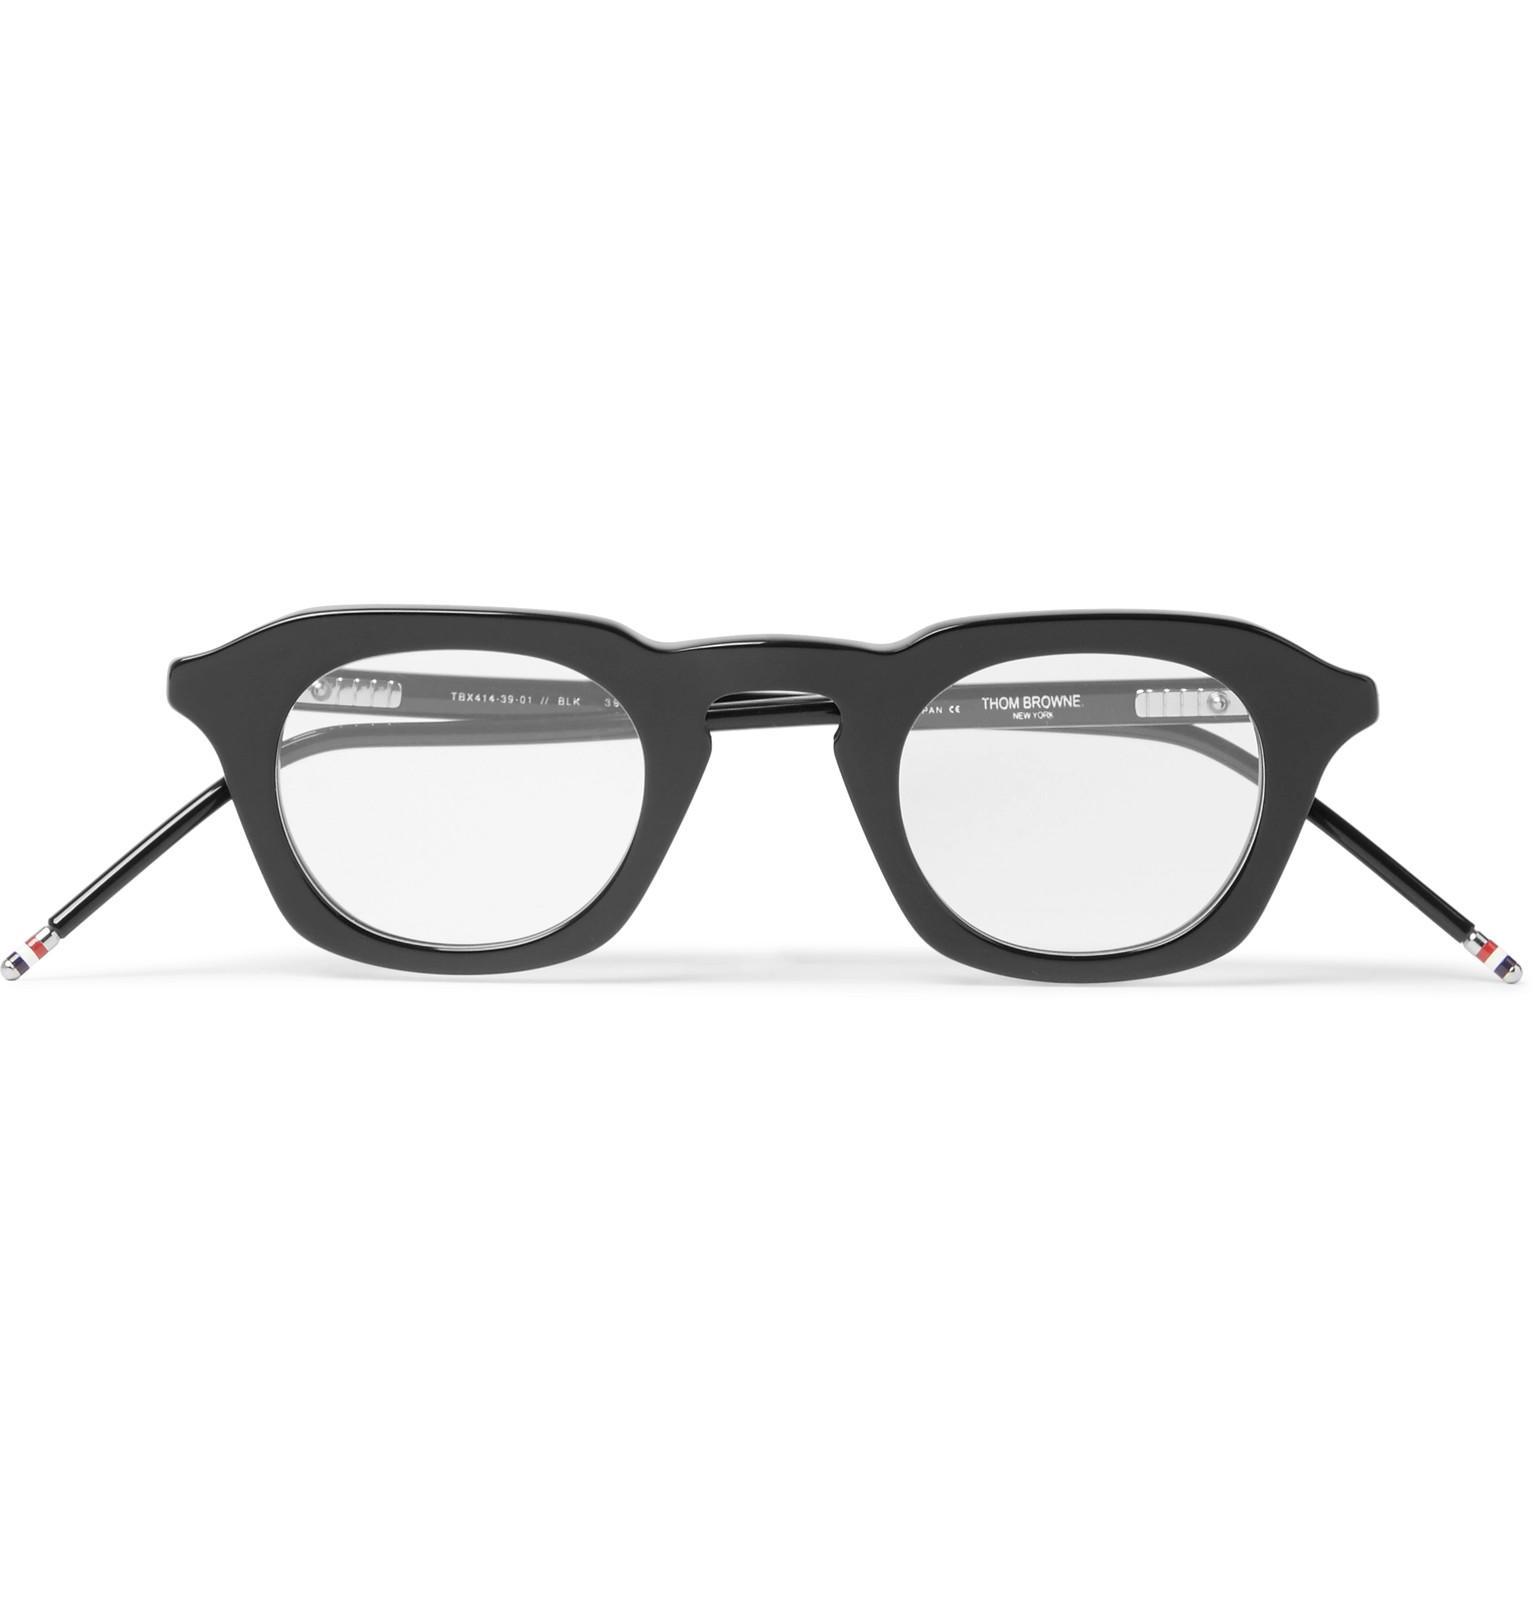 321d35fcdb46 Thom Browne 414 D-frame Acetate Optical Glasses in Black for Men - Lyst